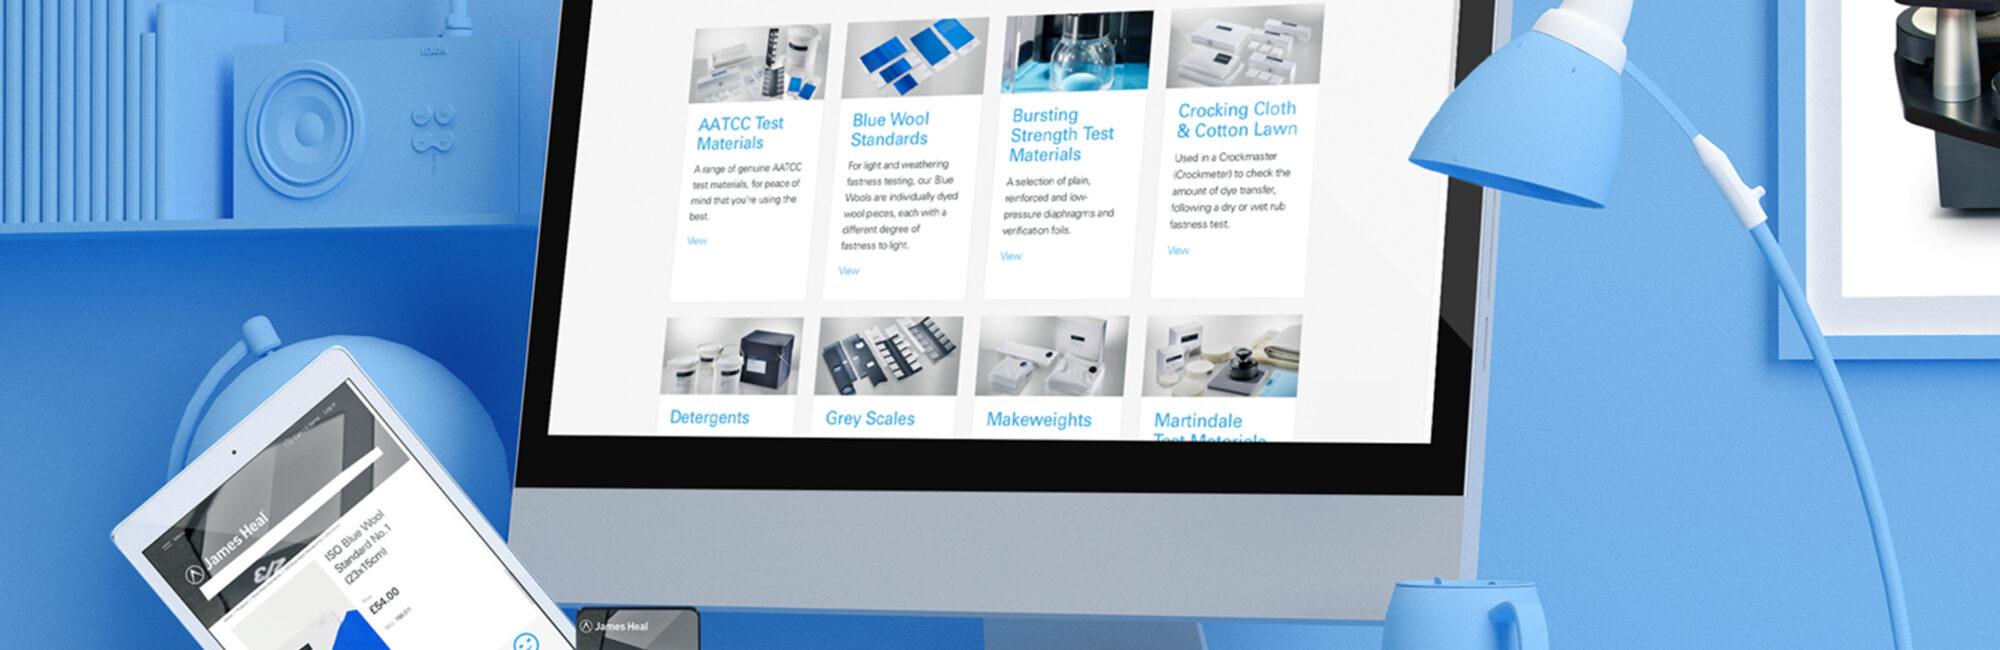 online test materials shop